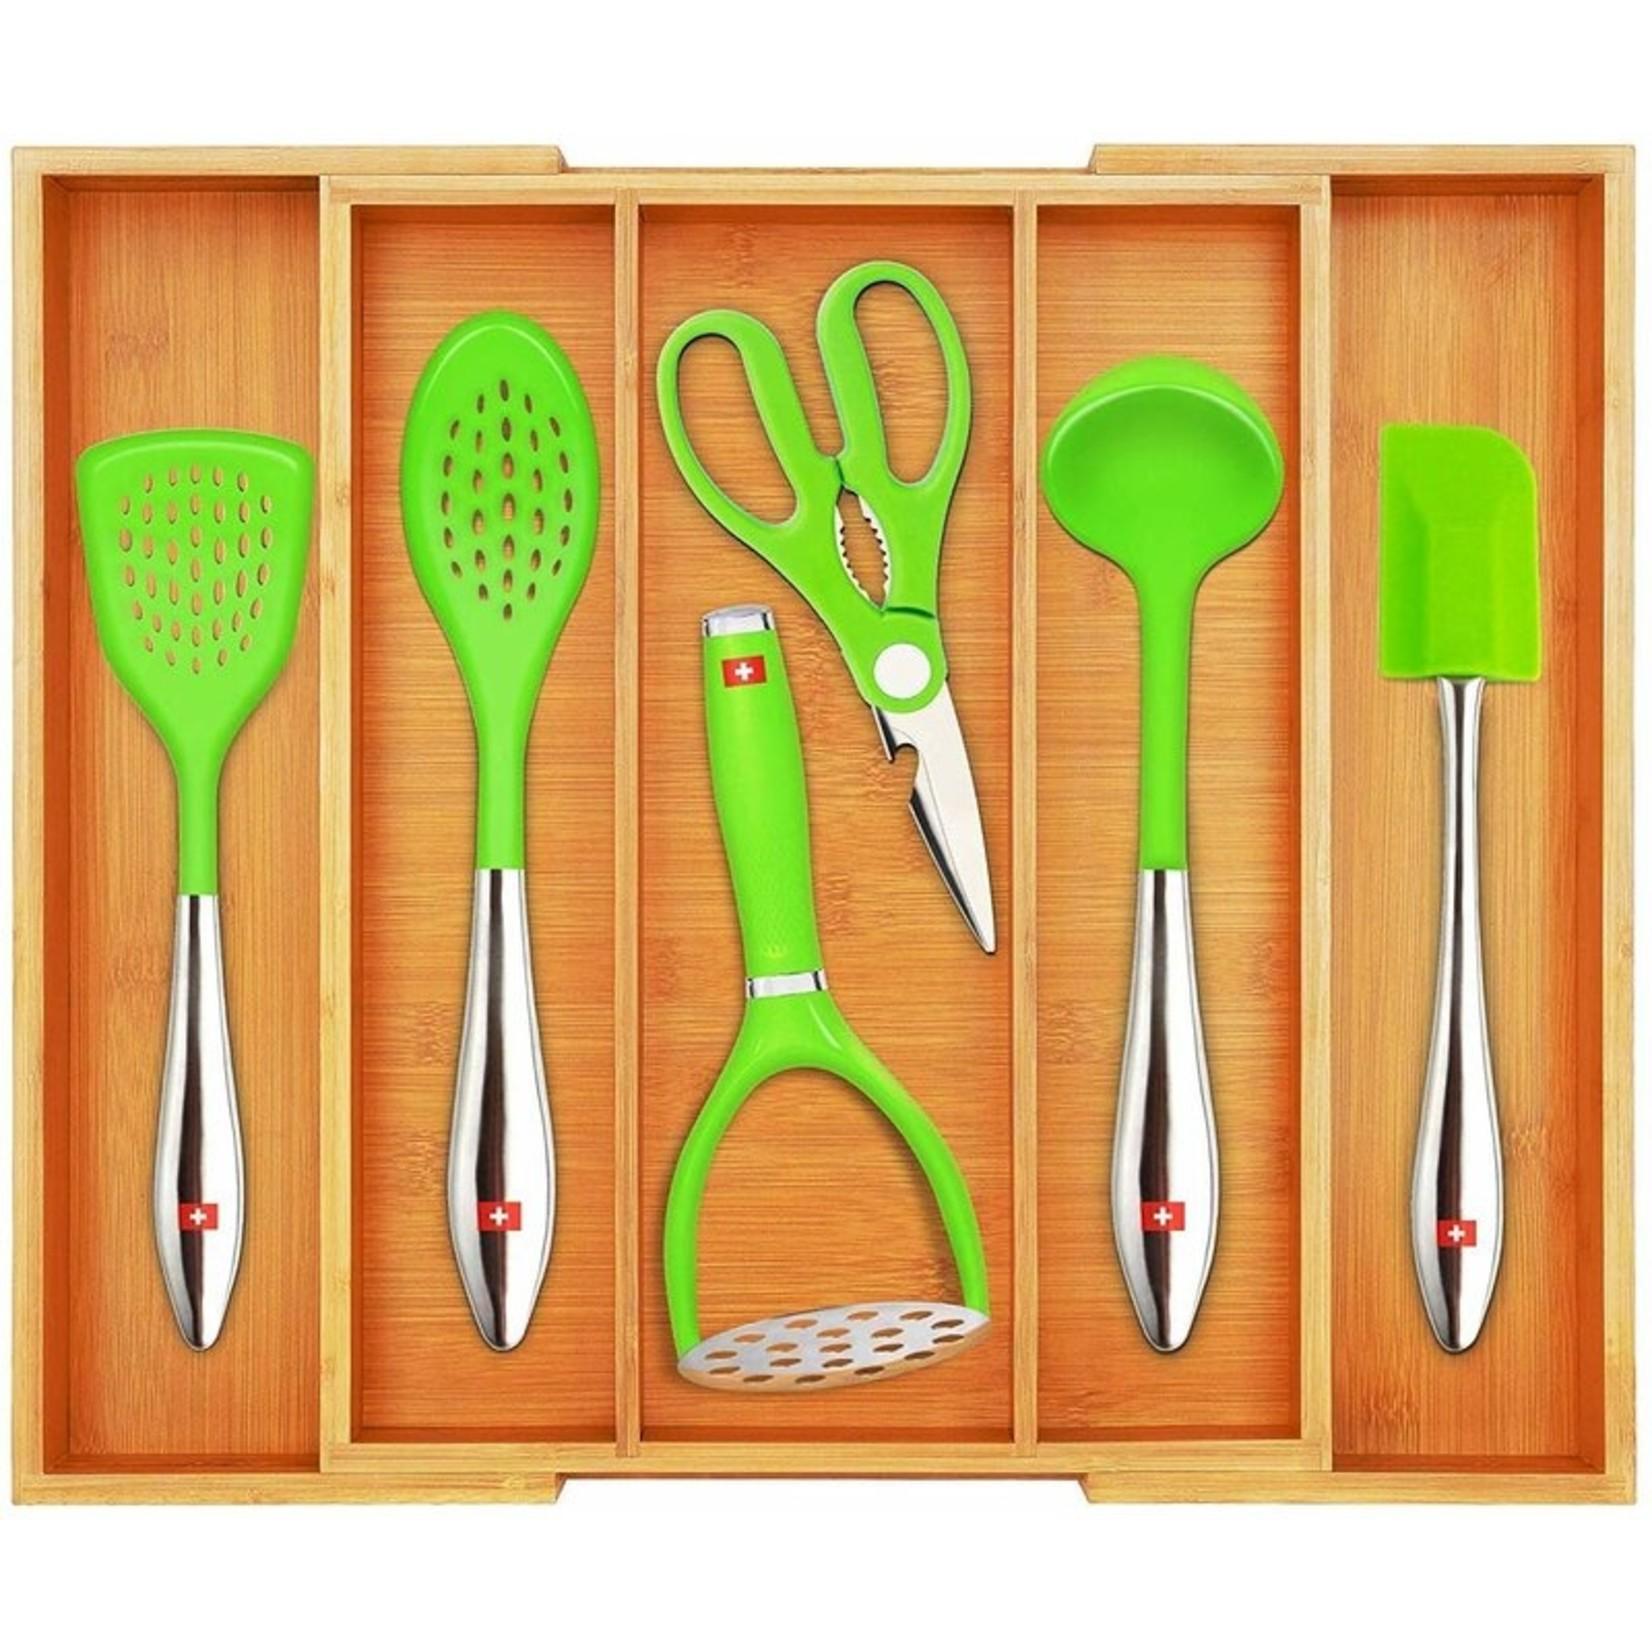 "*2.5""H x13""- 23""W x 18""D Drawer Organizer - Bamboo"